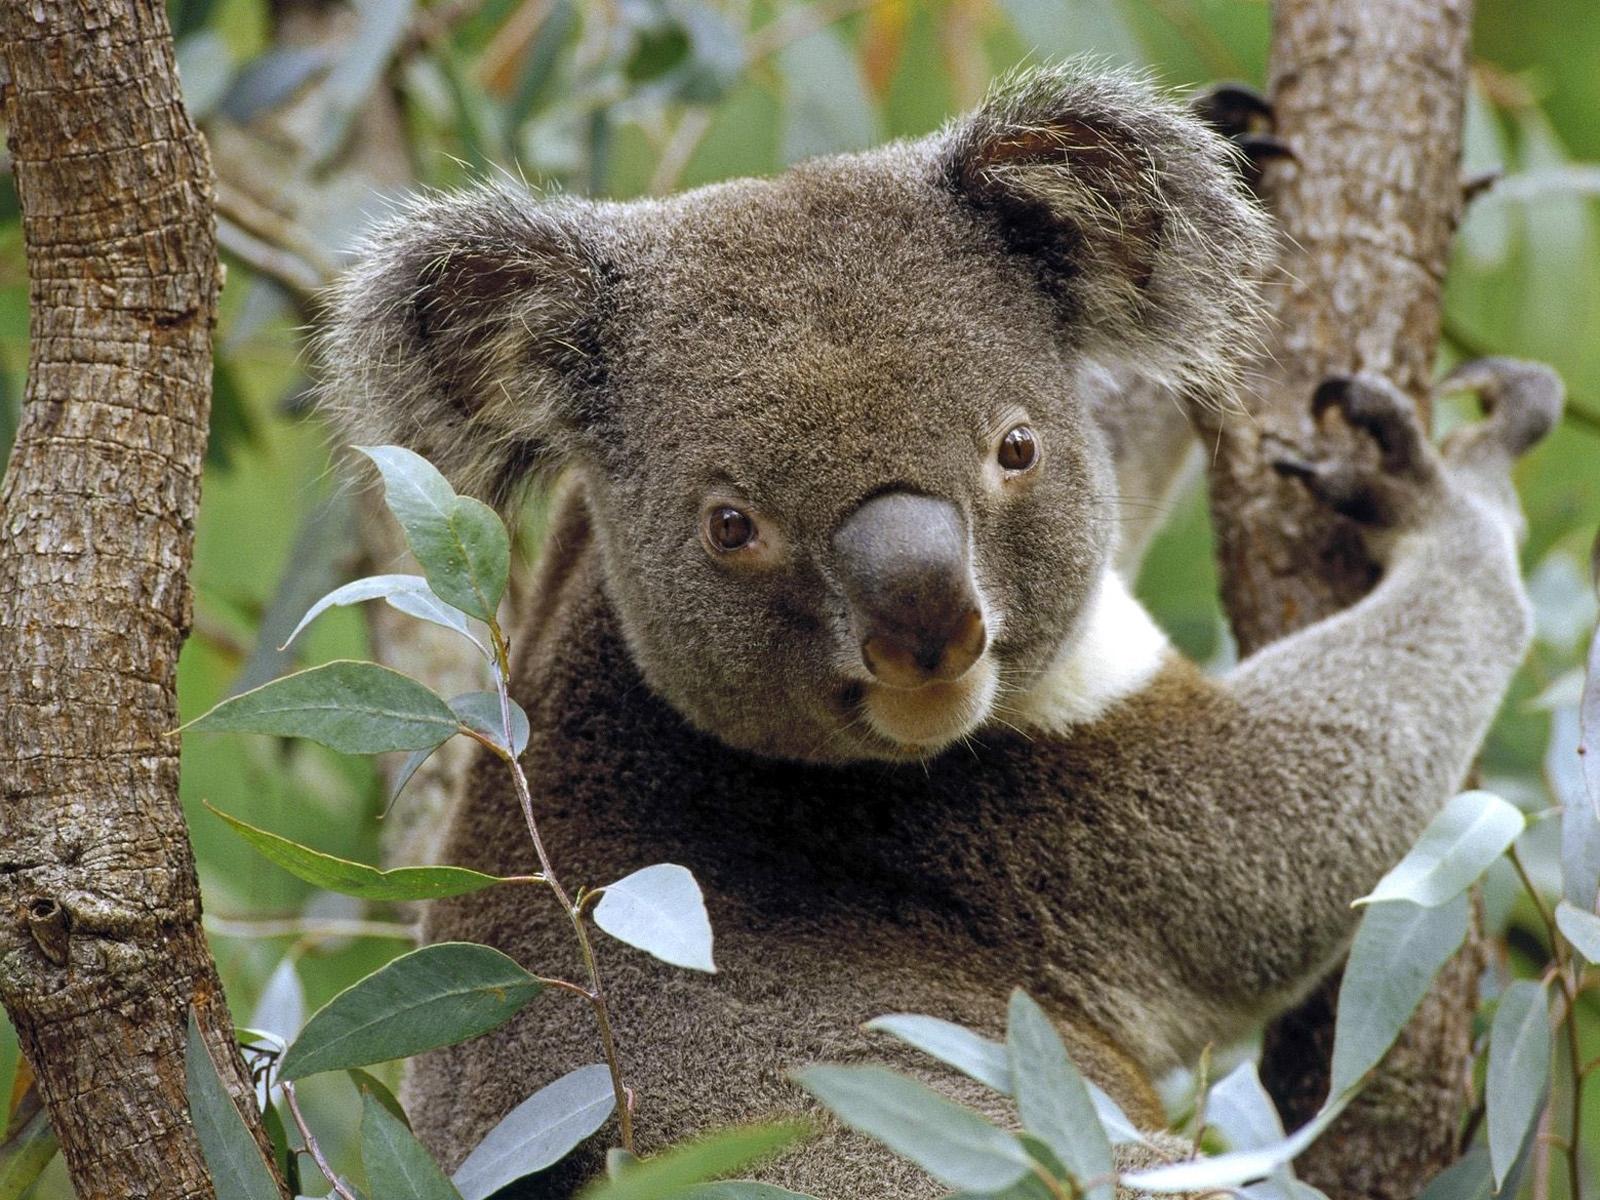 Download mobile wallpaper Animals, Koalas for free.